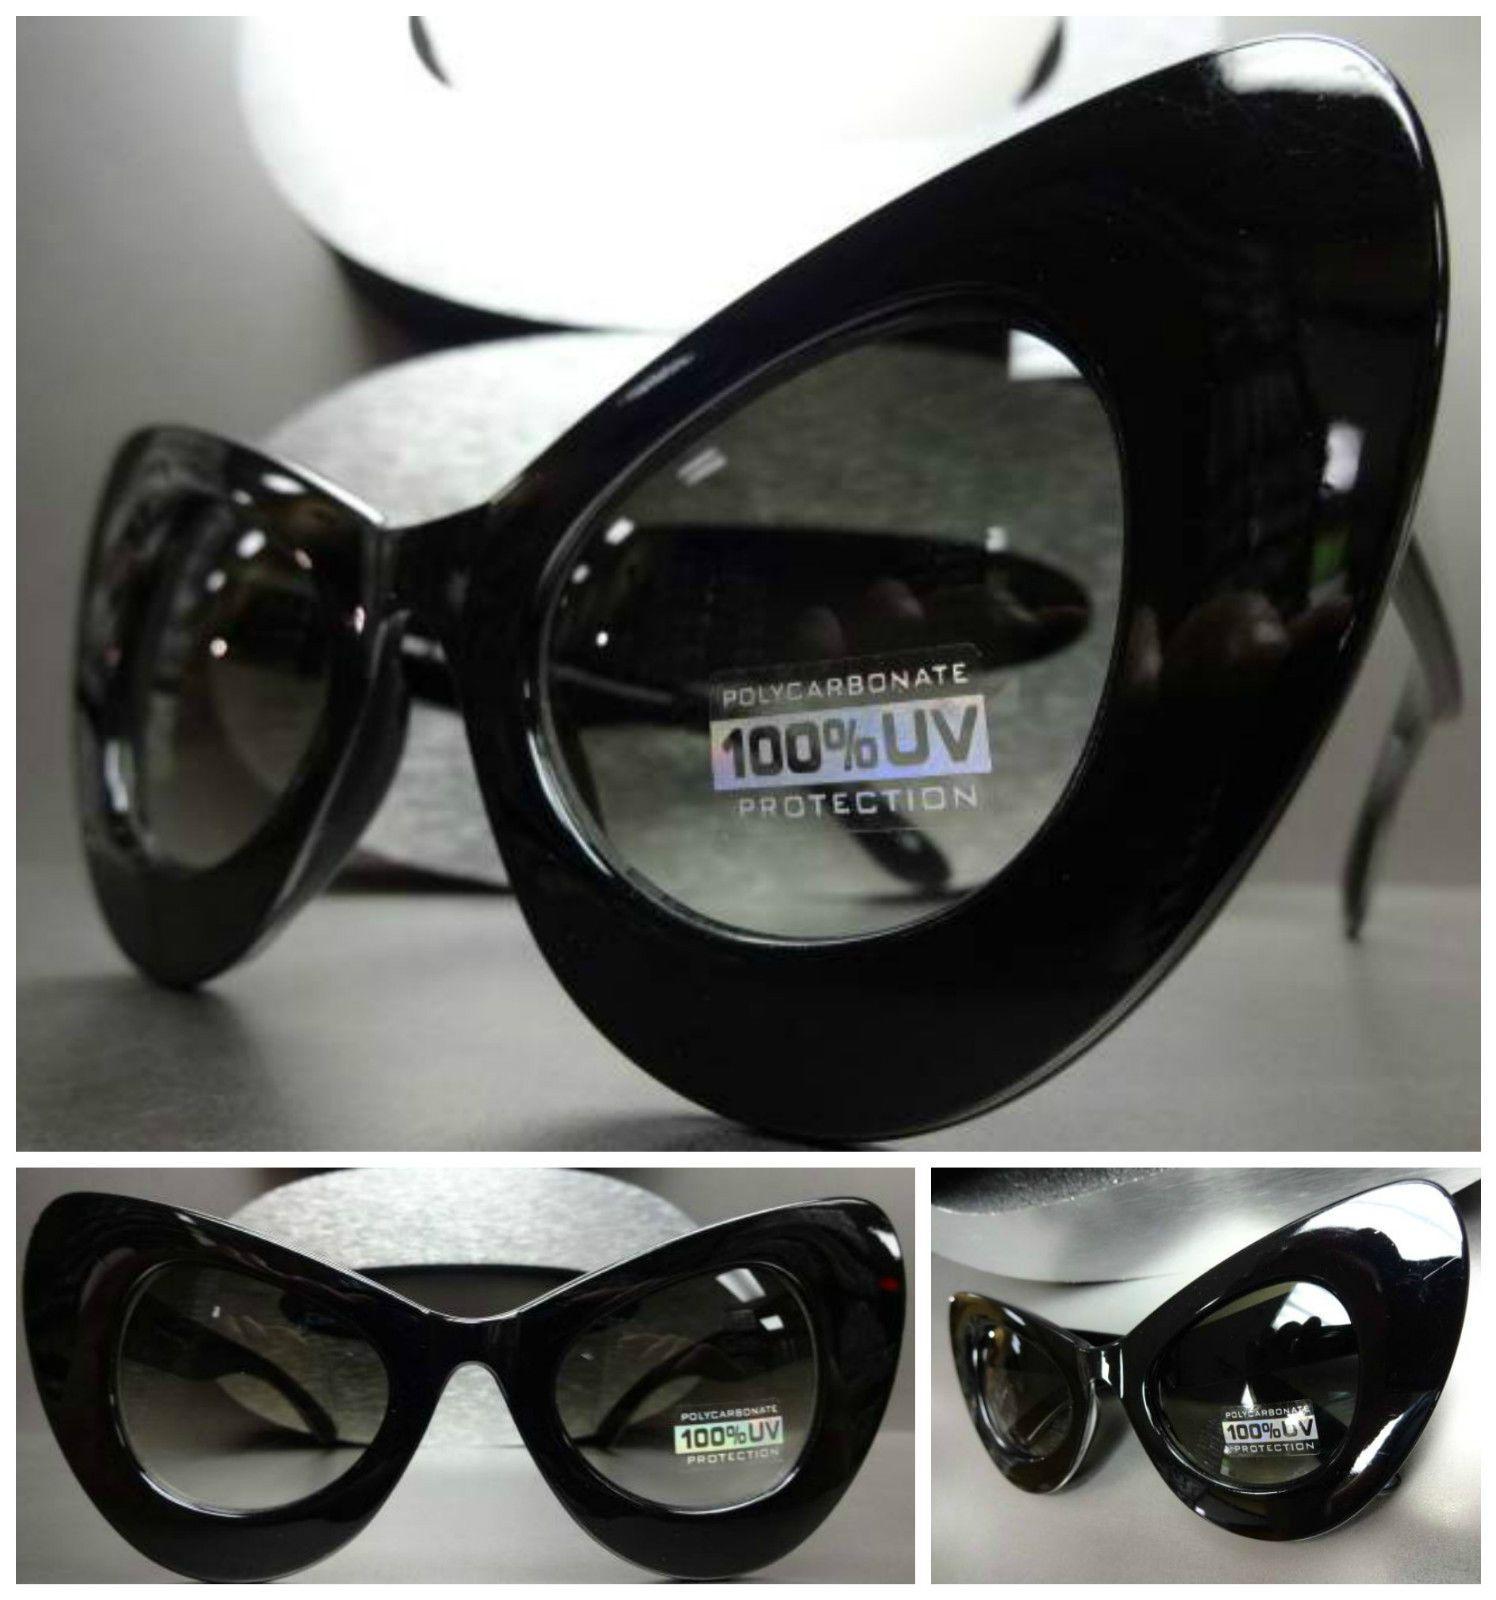 41939c056b1d Oversize Exaggerated Vintage 60 s Cat Eye Style Sun Glasses Large Black  Frame